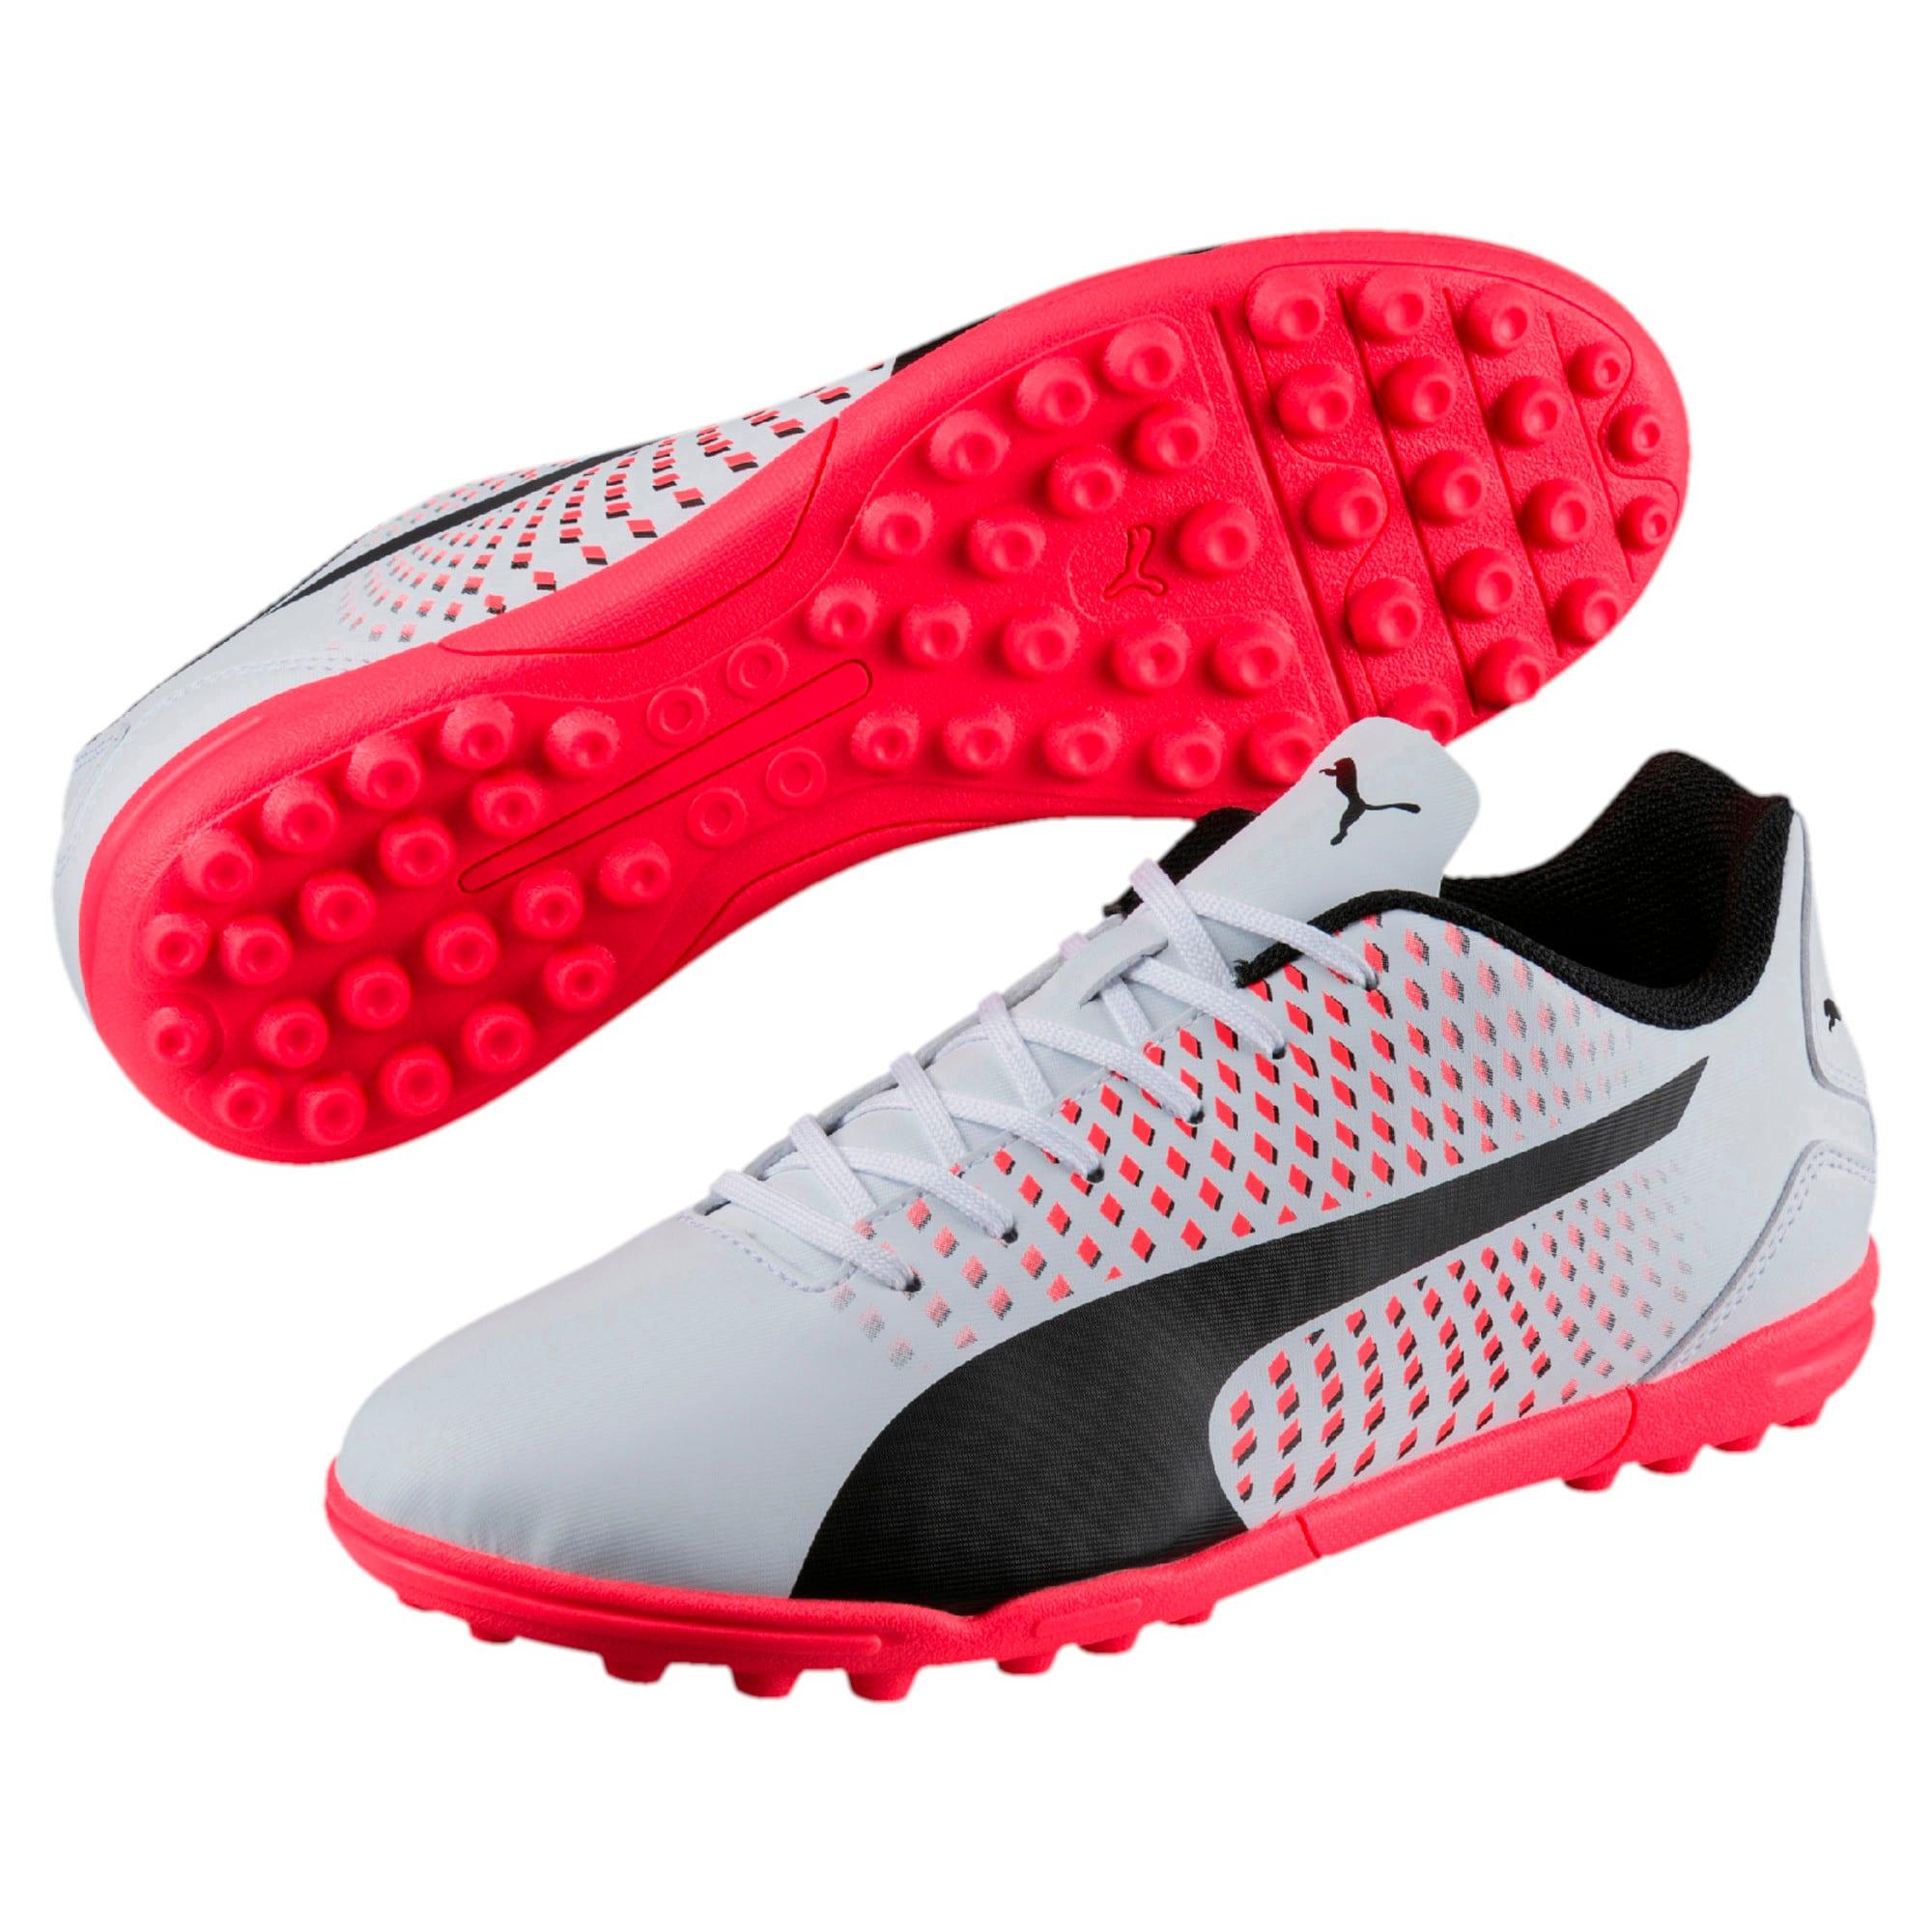 Thumbnail 6 of Adreno III TT Men's Football Boots, White-Black-Coral, medium-IND